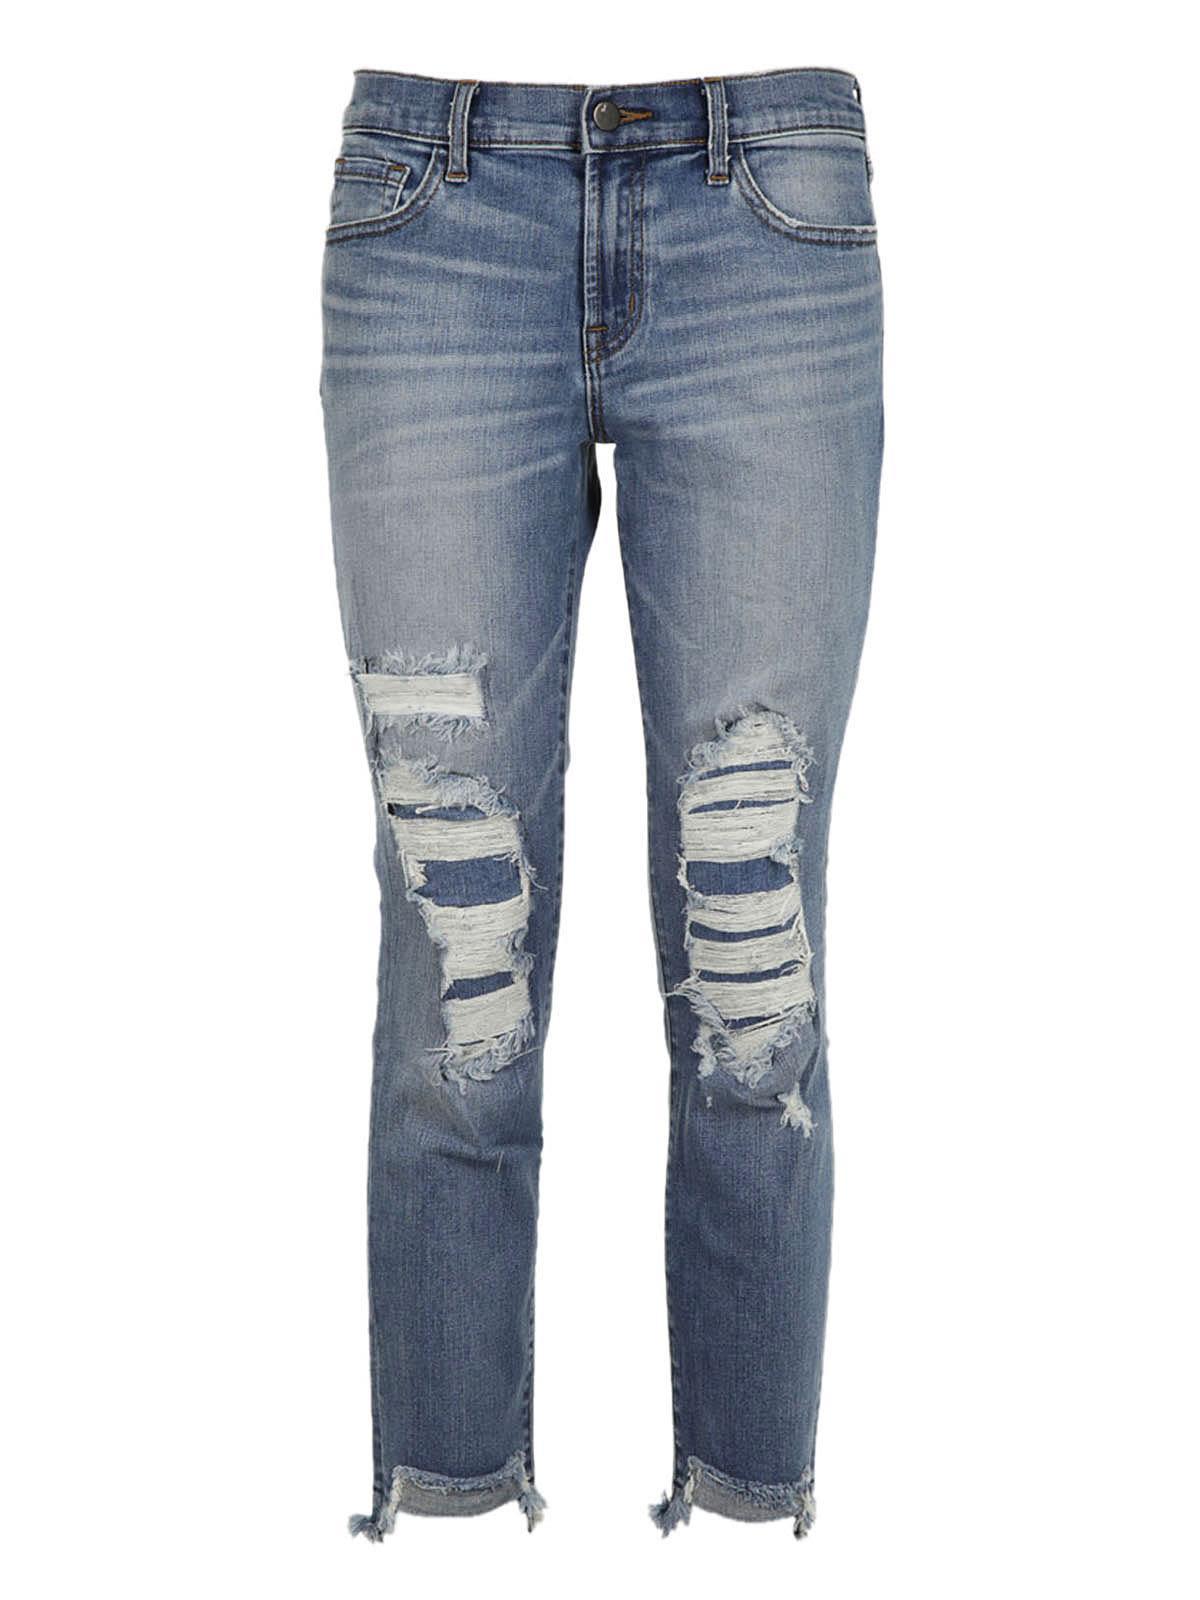 J Brand Ripped Denim Jeans